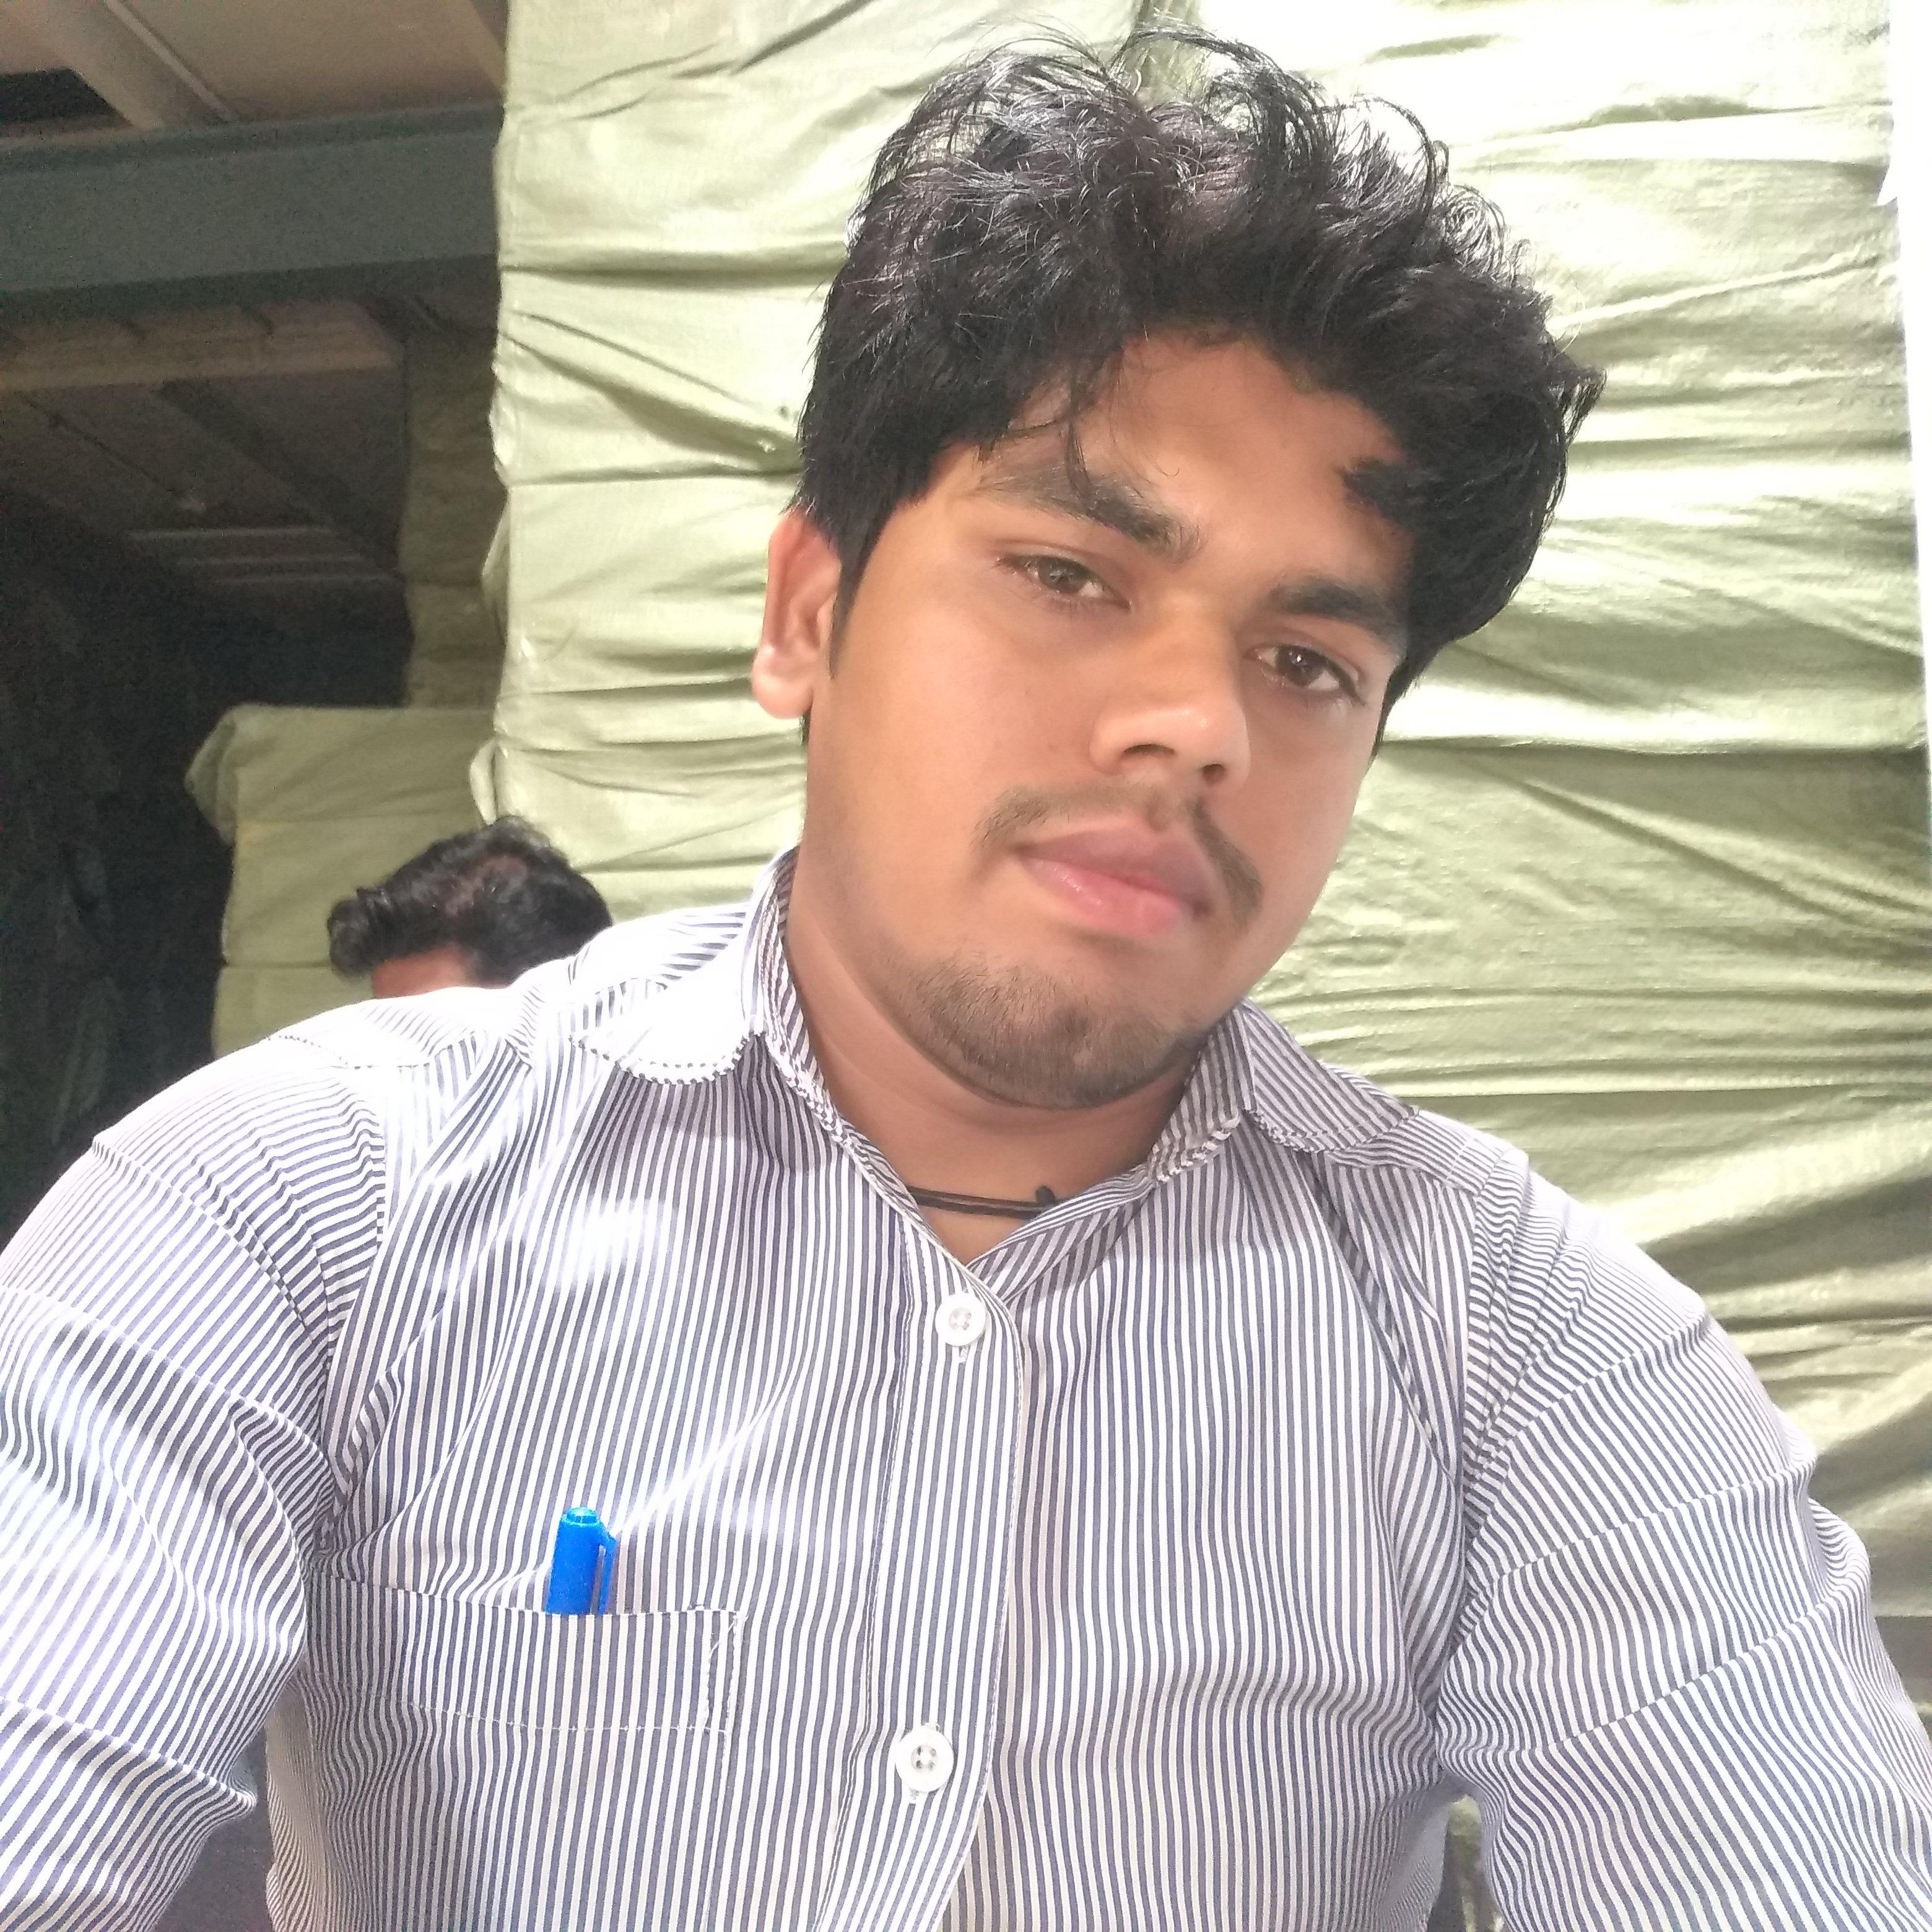 Ram jee kushwaha